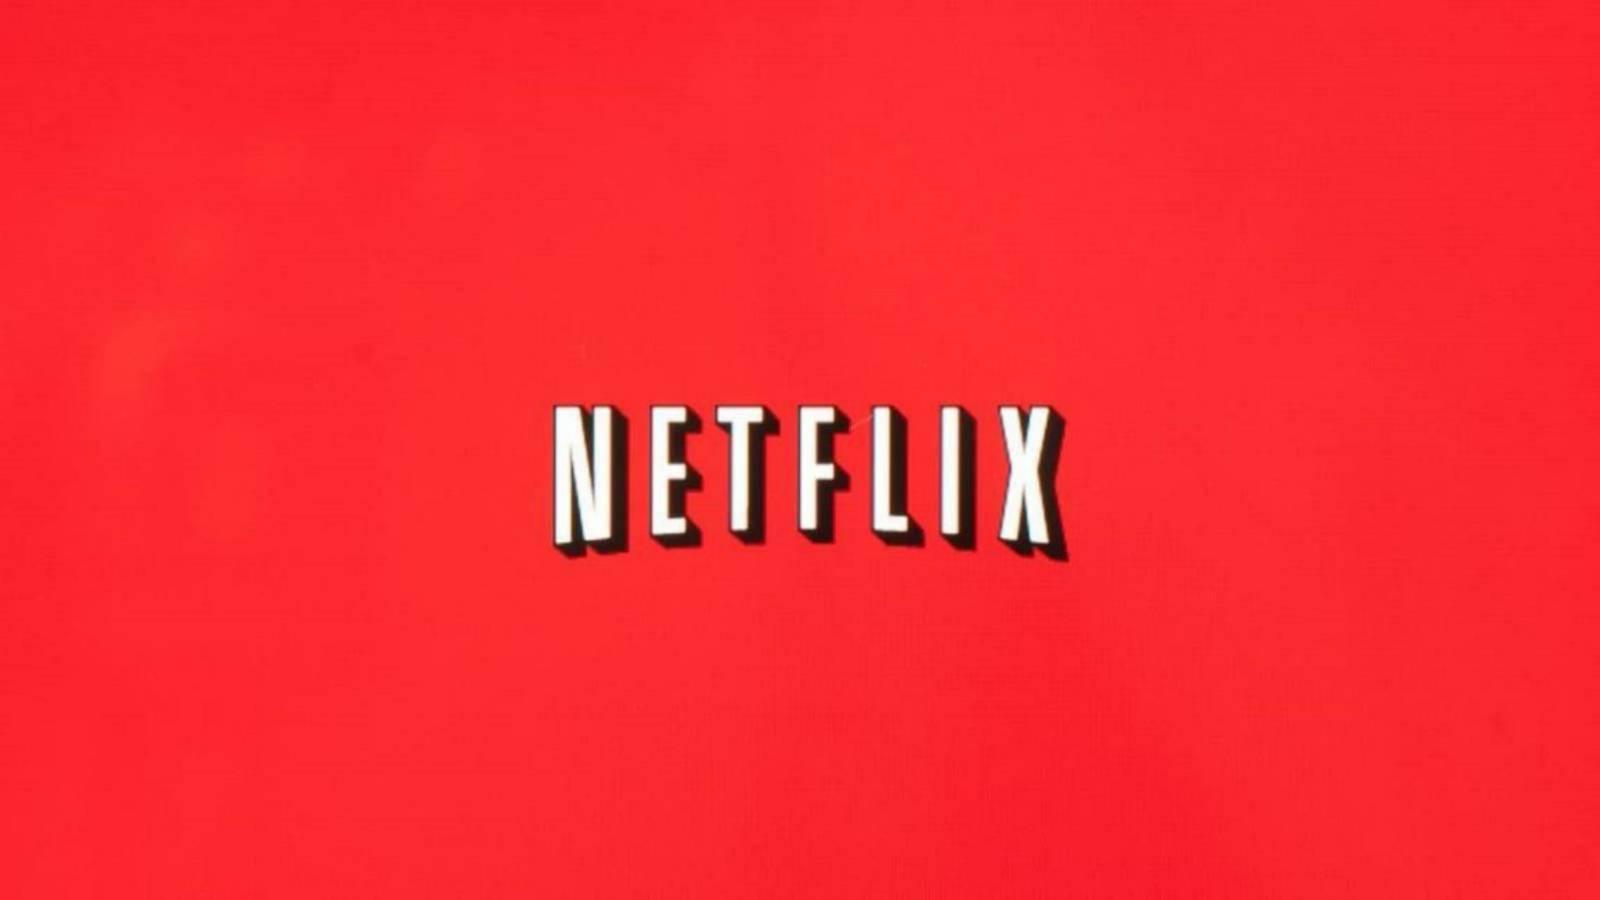 Netflix categorii